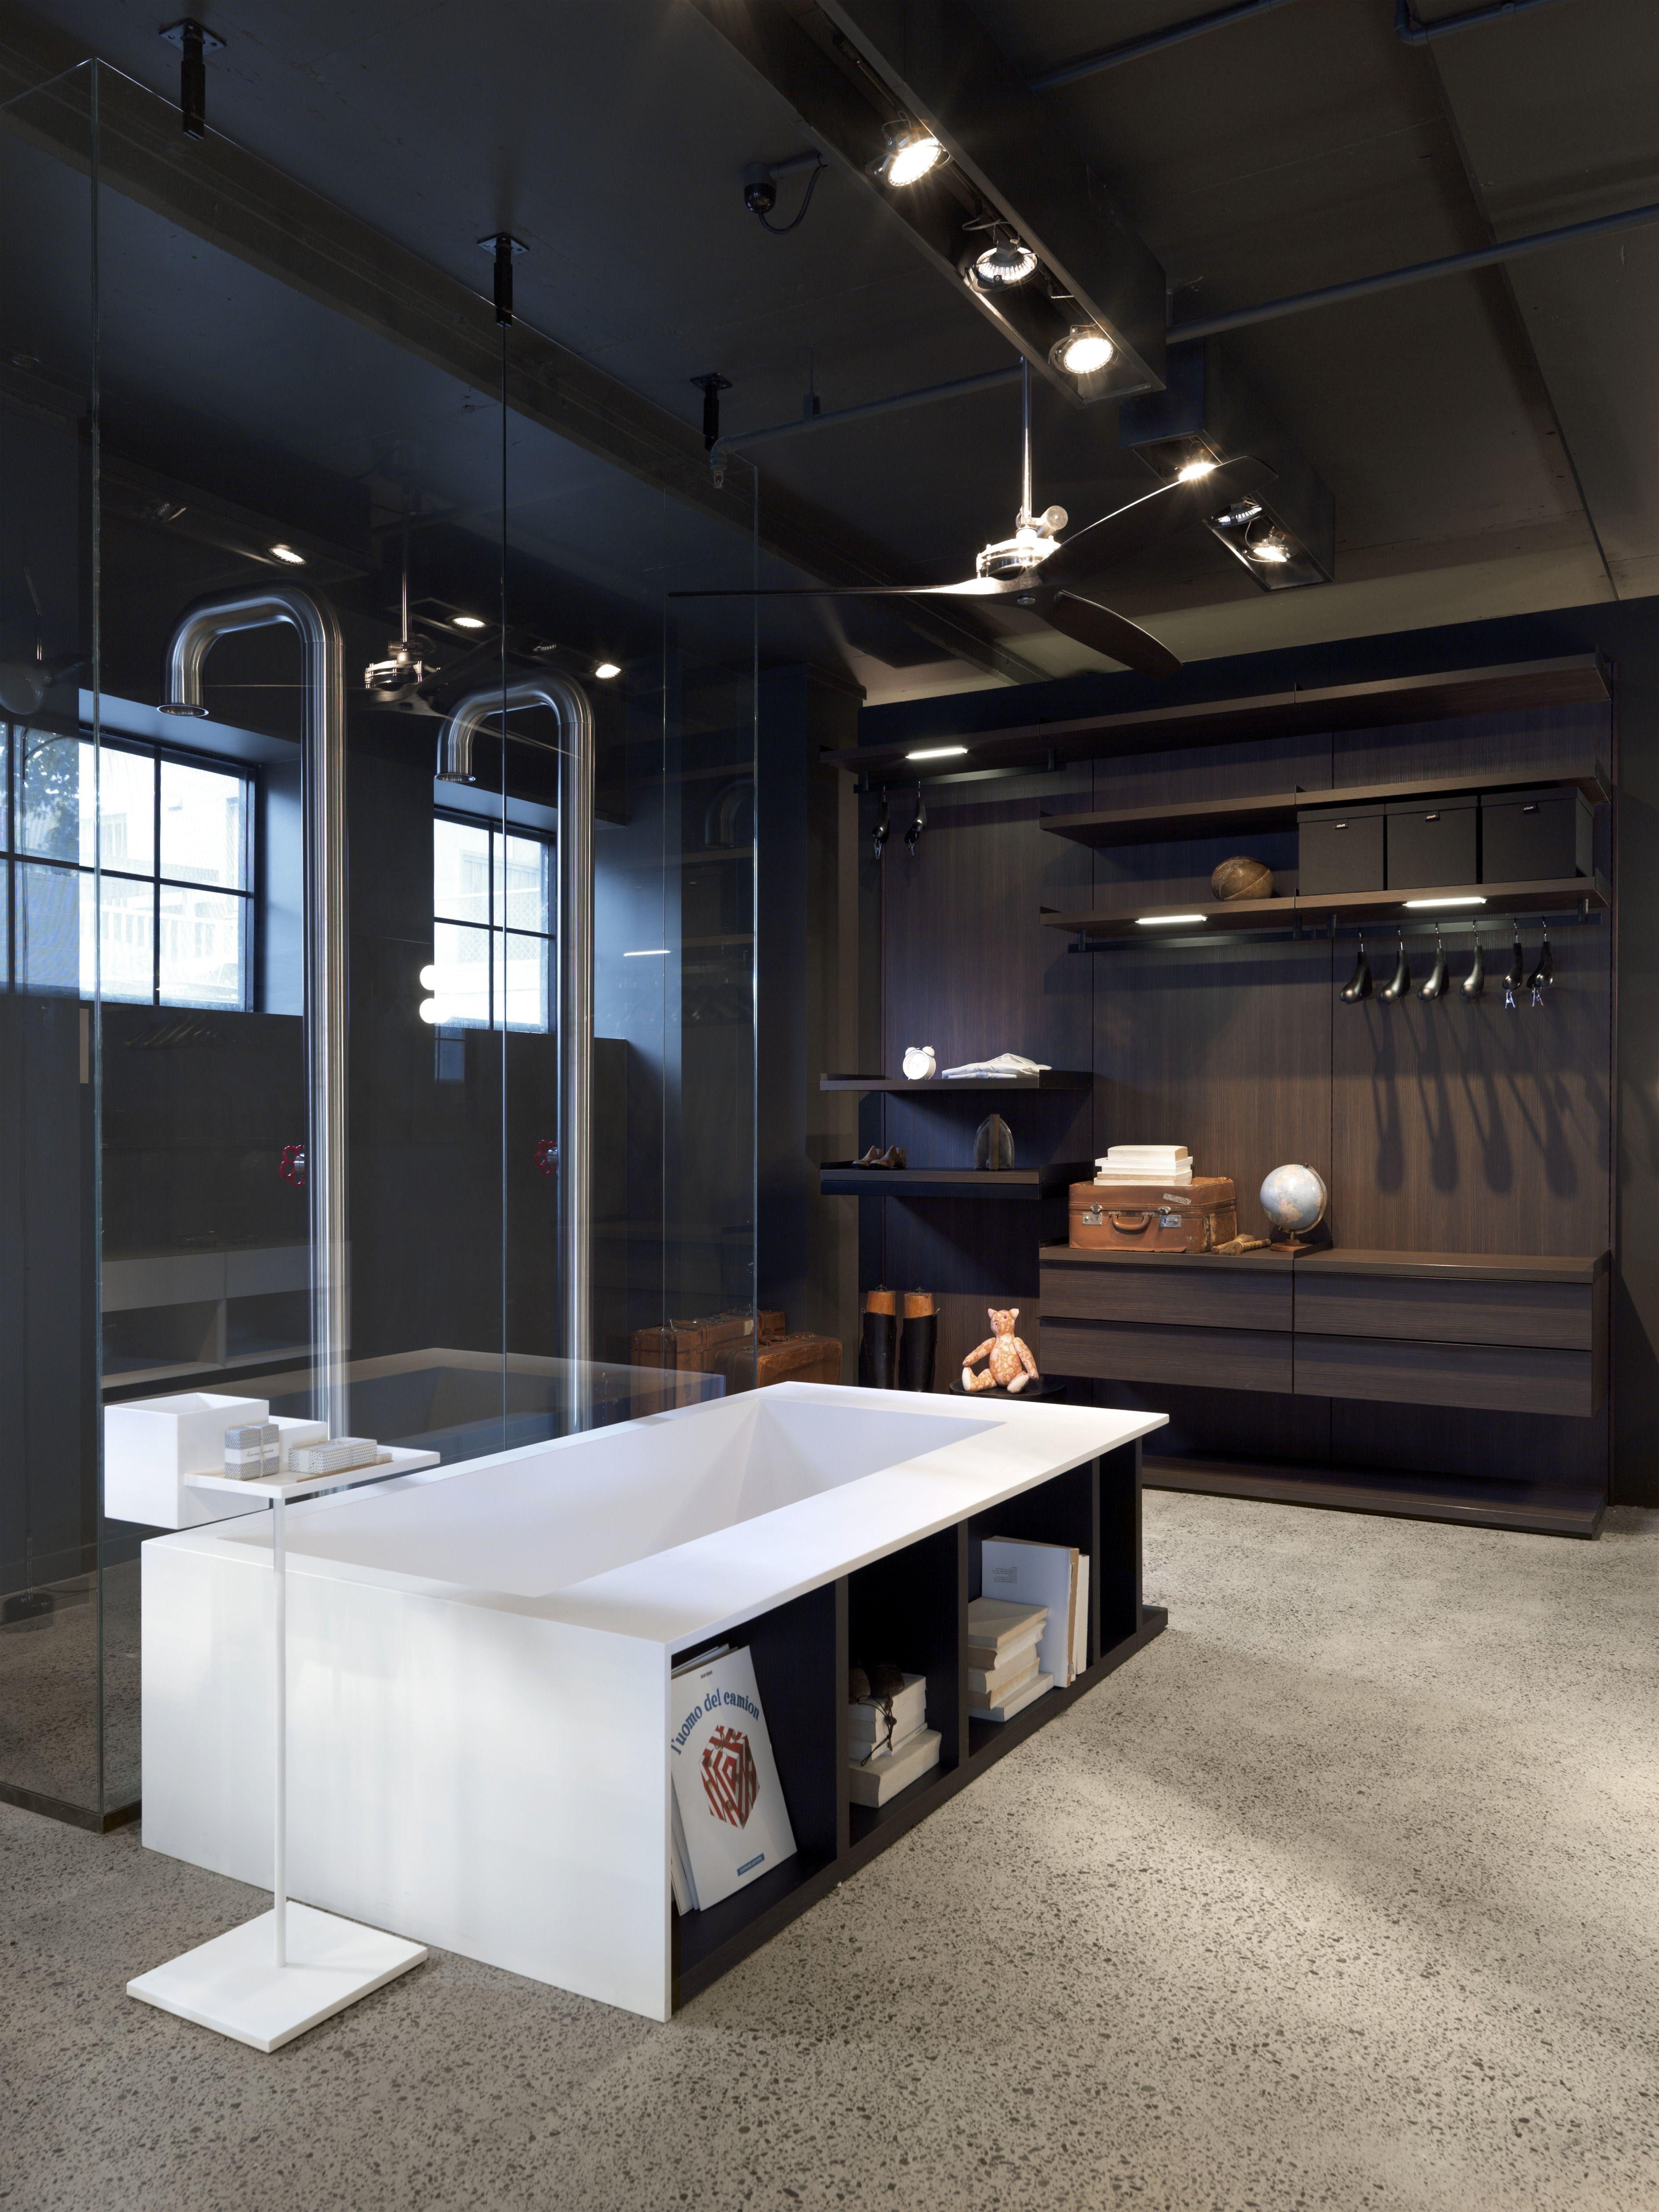 boffi swim c bath pipe freestanding shower minimal air. Black Bedroom Furniture Sets. Home Design Ideas